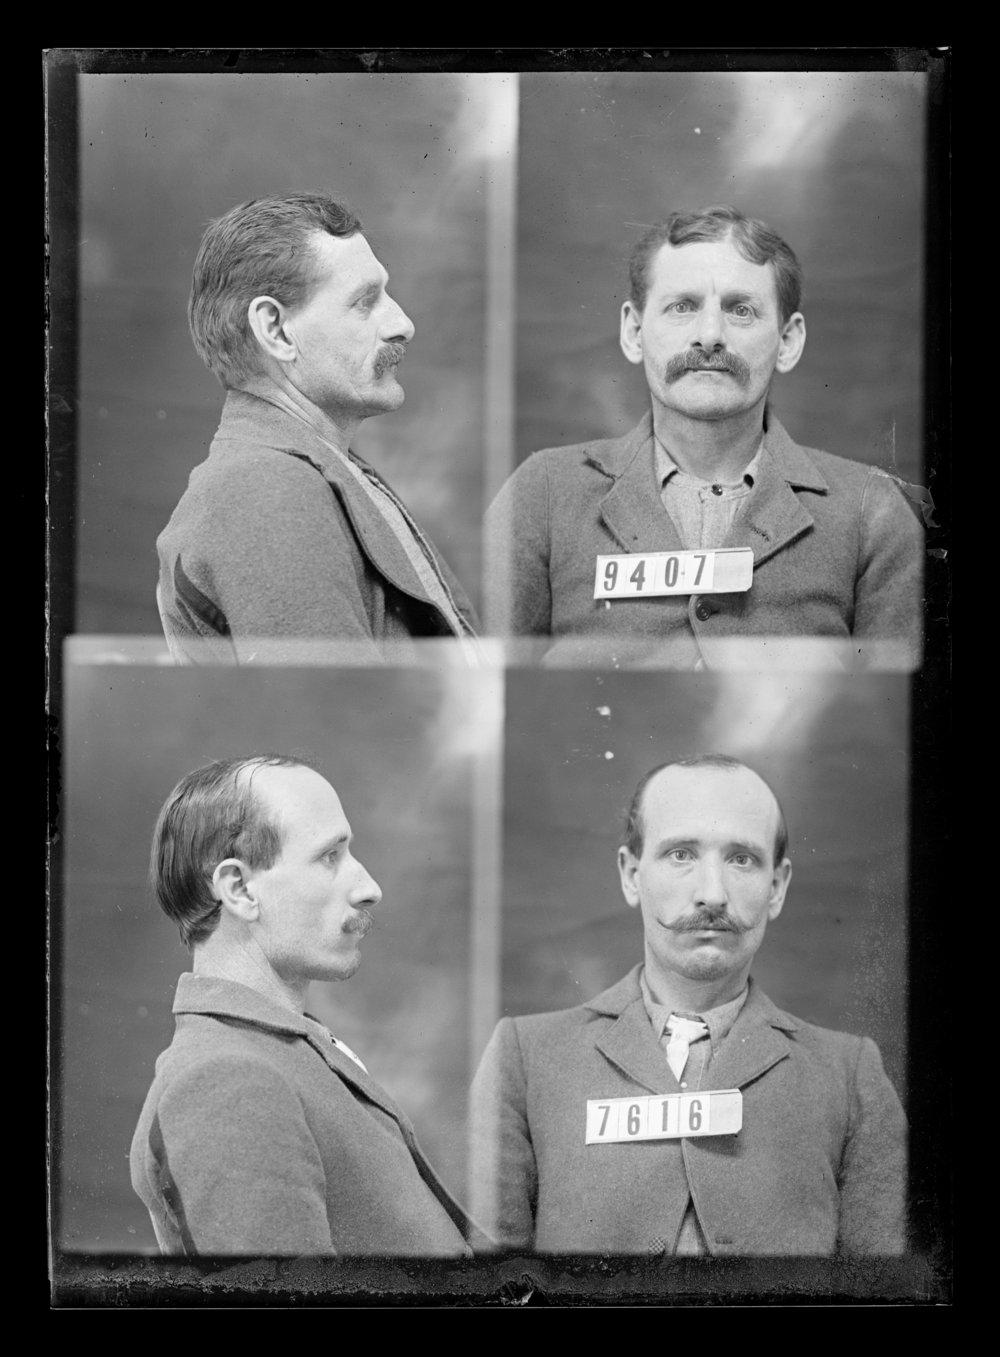 Charles Carey and J. F. Berlstein, prisoners 7616 and 9407, Kansas State Penitentiary